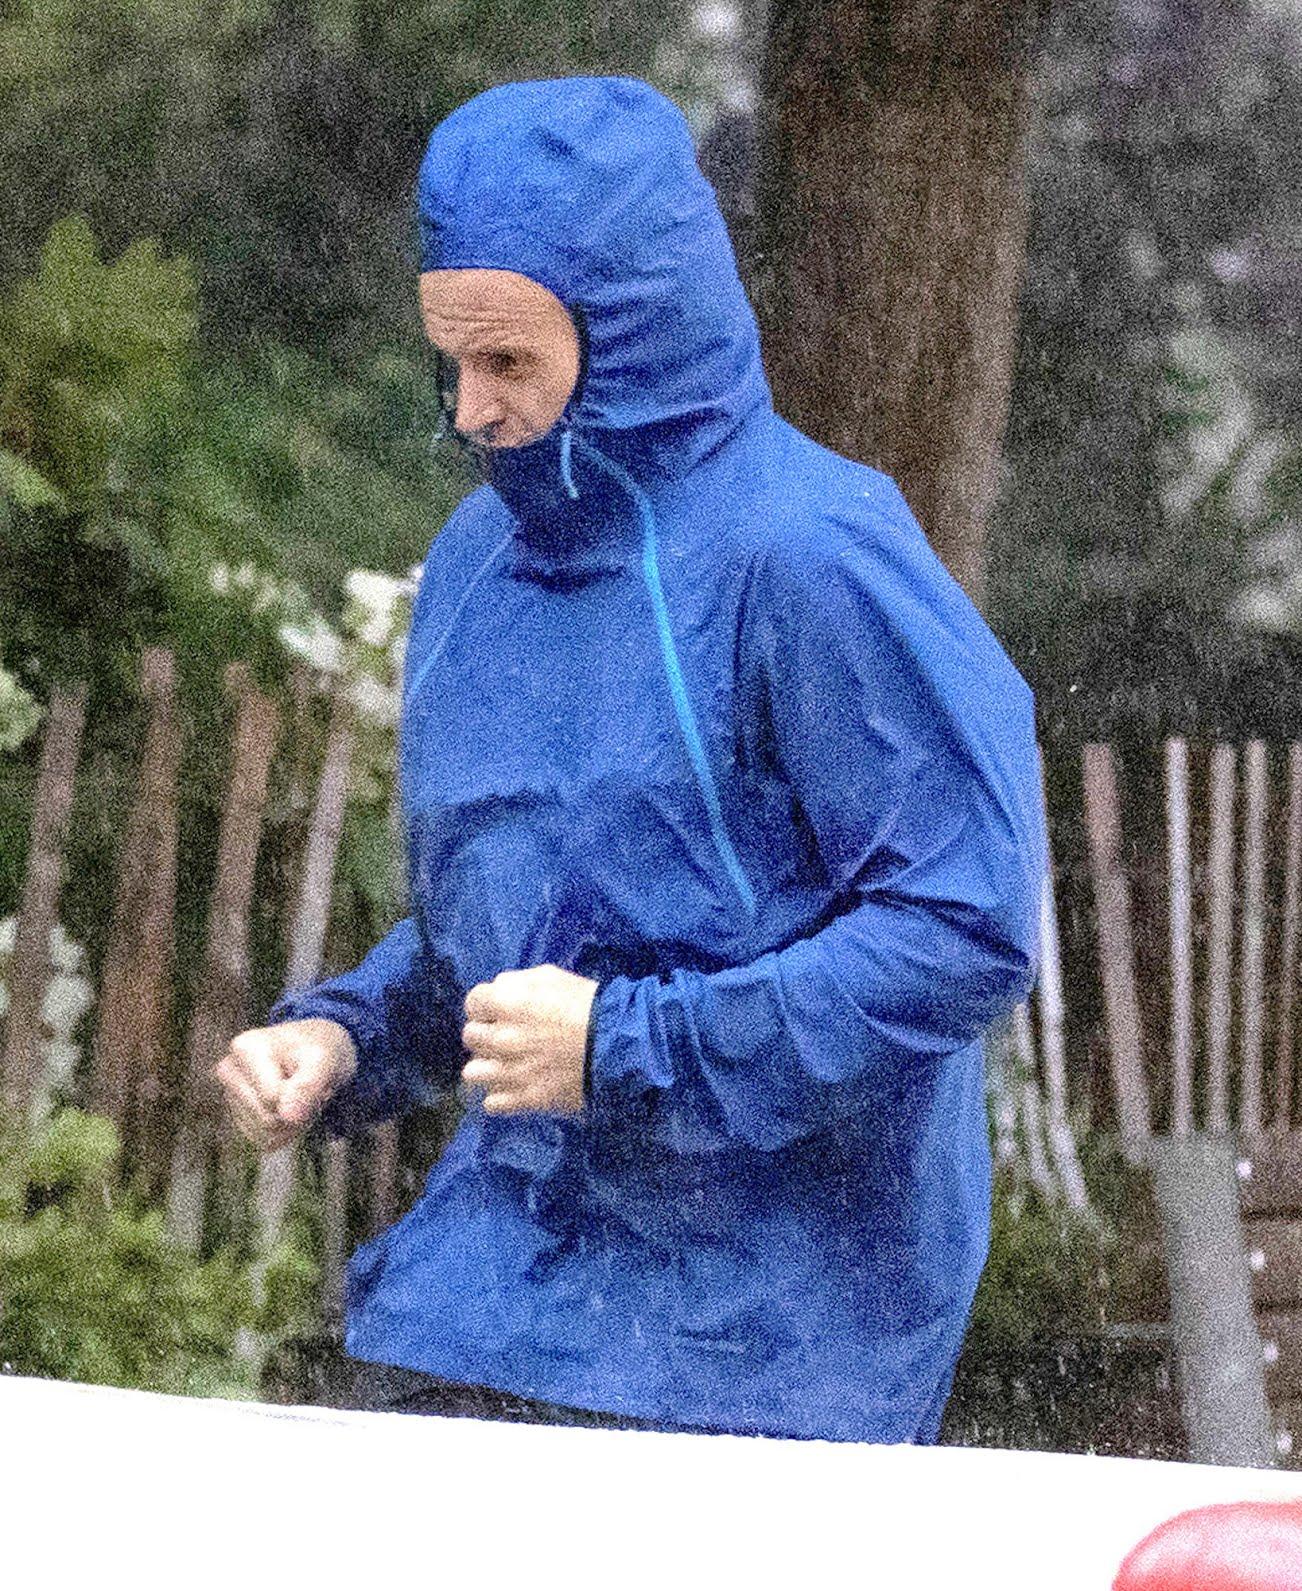 Jonny Lee Miller jogging in the rain